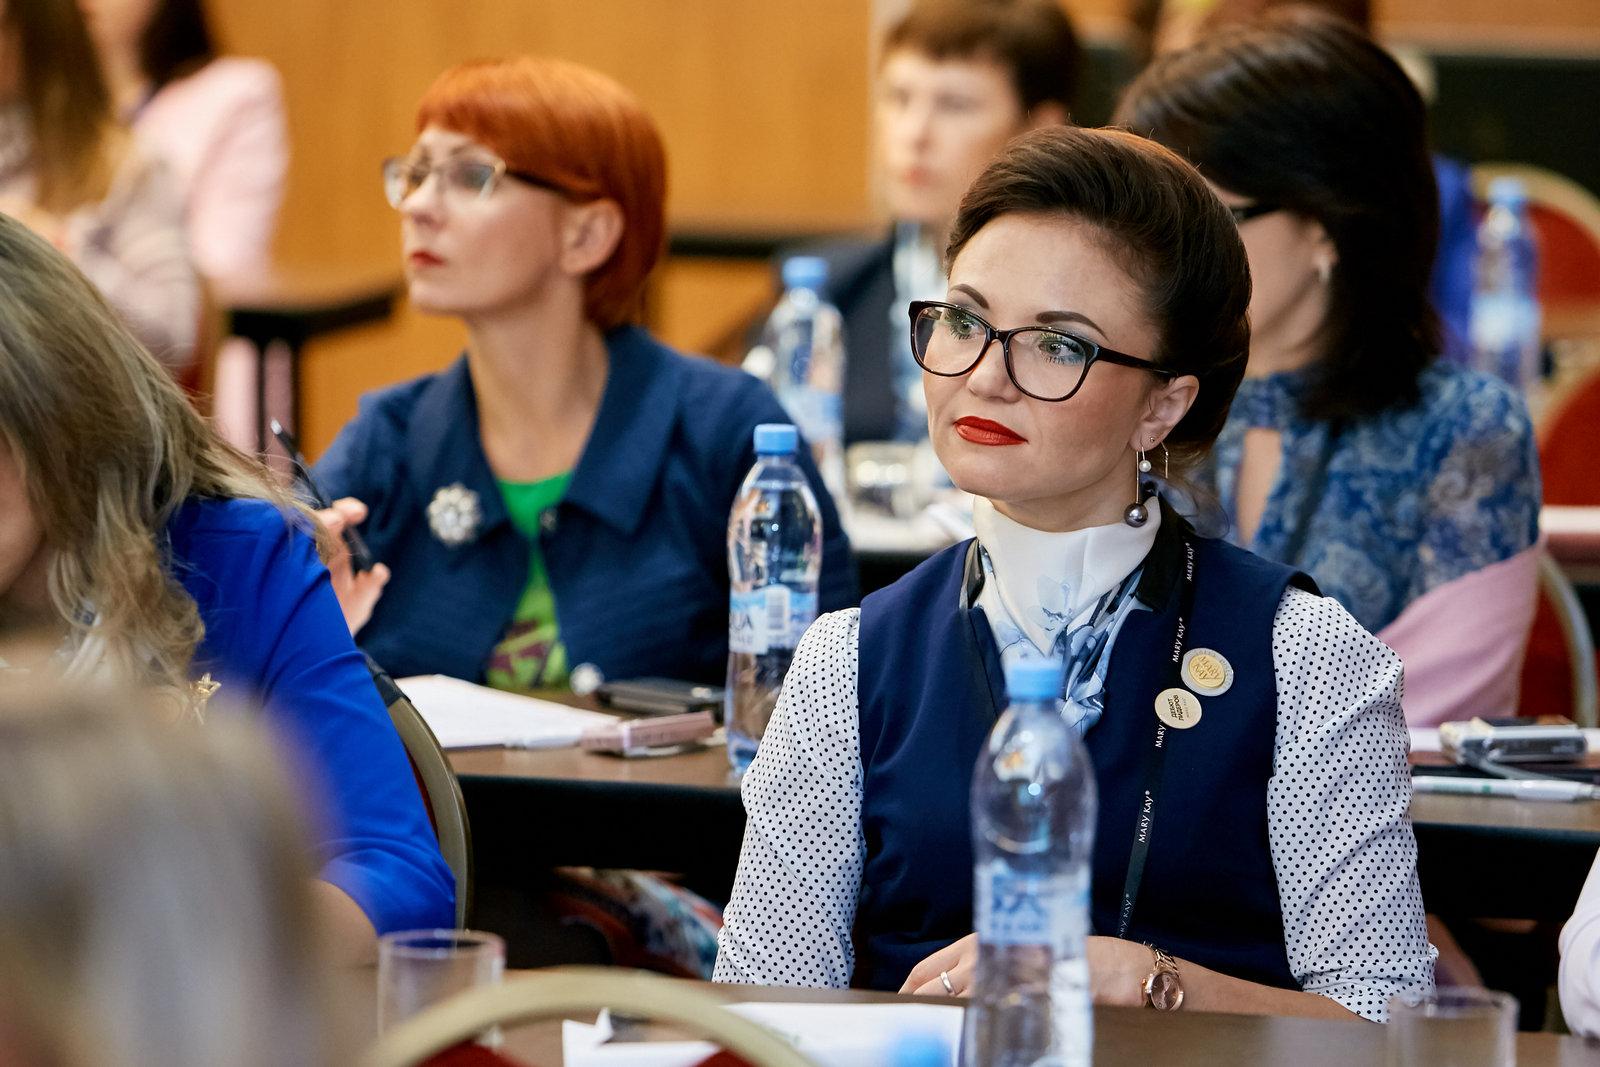 Репортаж и бизнес фото в Москве